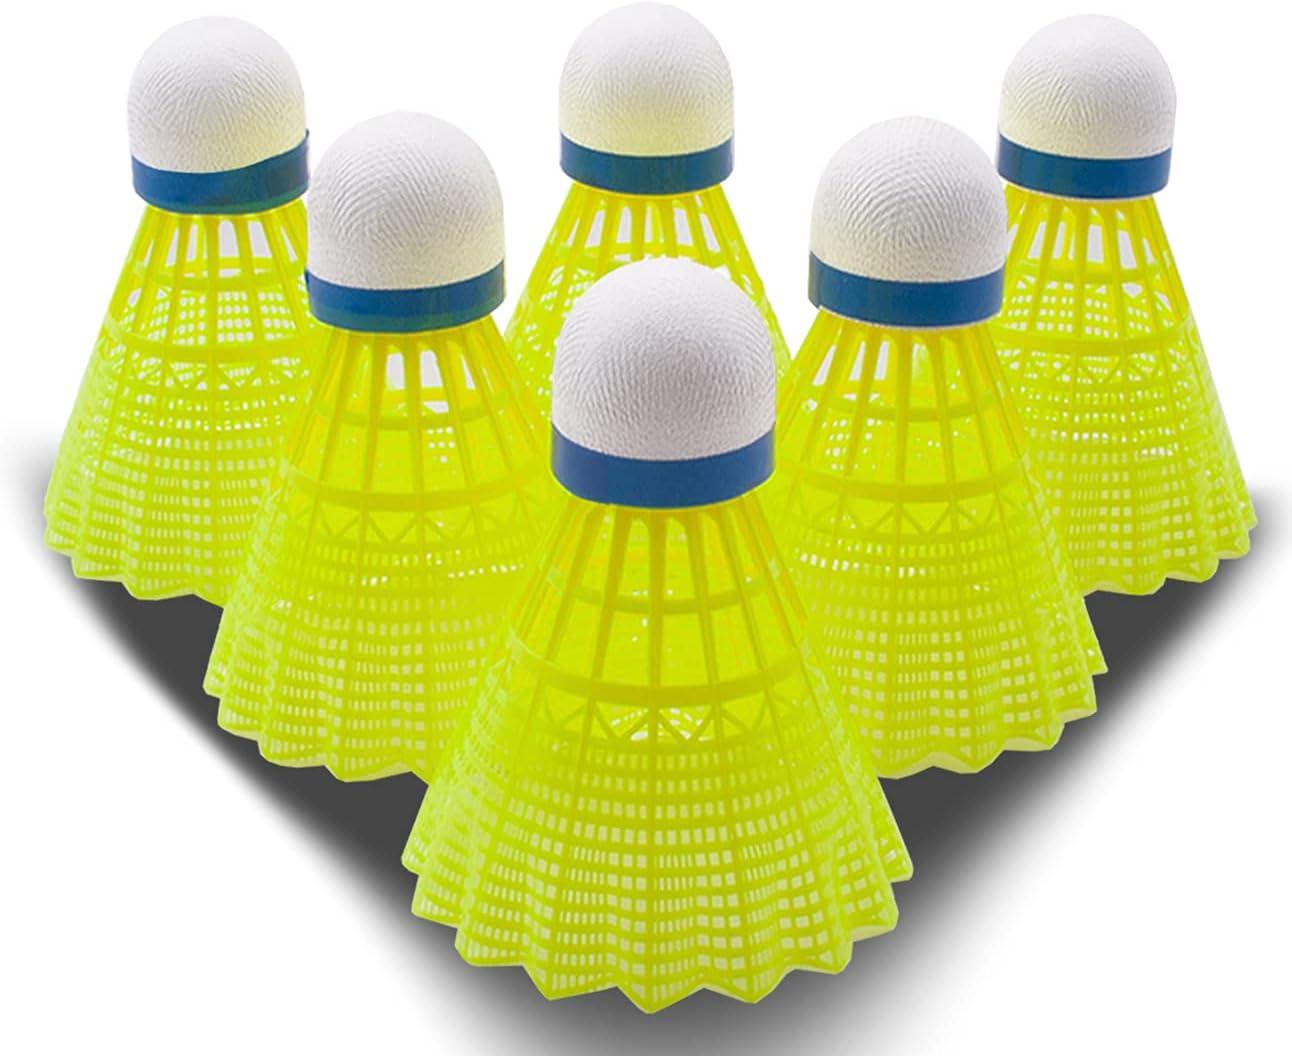 Sinwind Shuttlecocks Badminton Shuttlecocks Balls 12 Pcs Nylon Badminton Balls Proffessional Badminton Birdies Balls Indoor Outdoor Sport Training Colorful